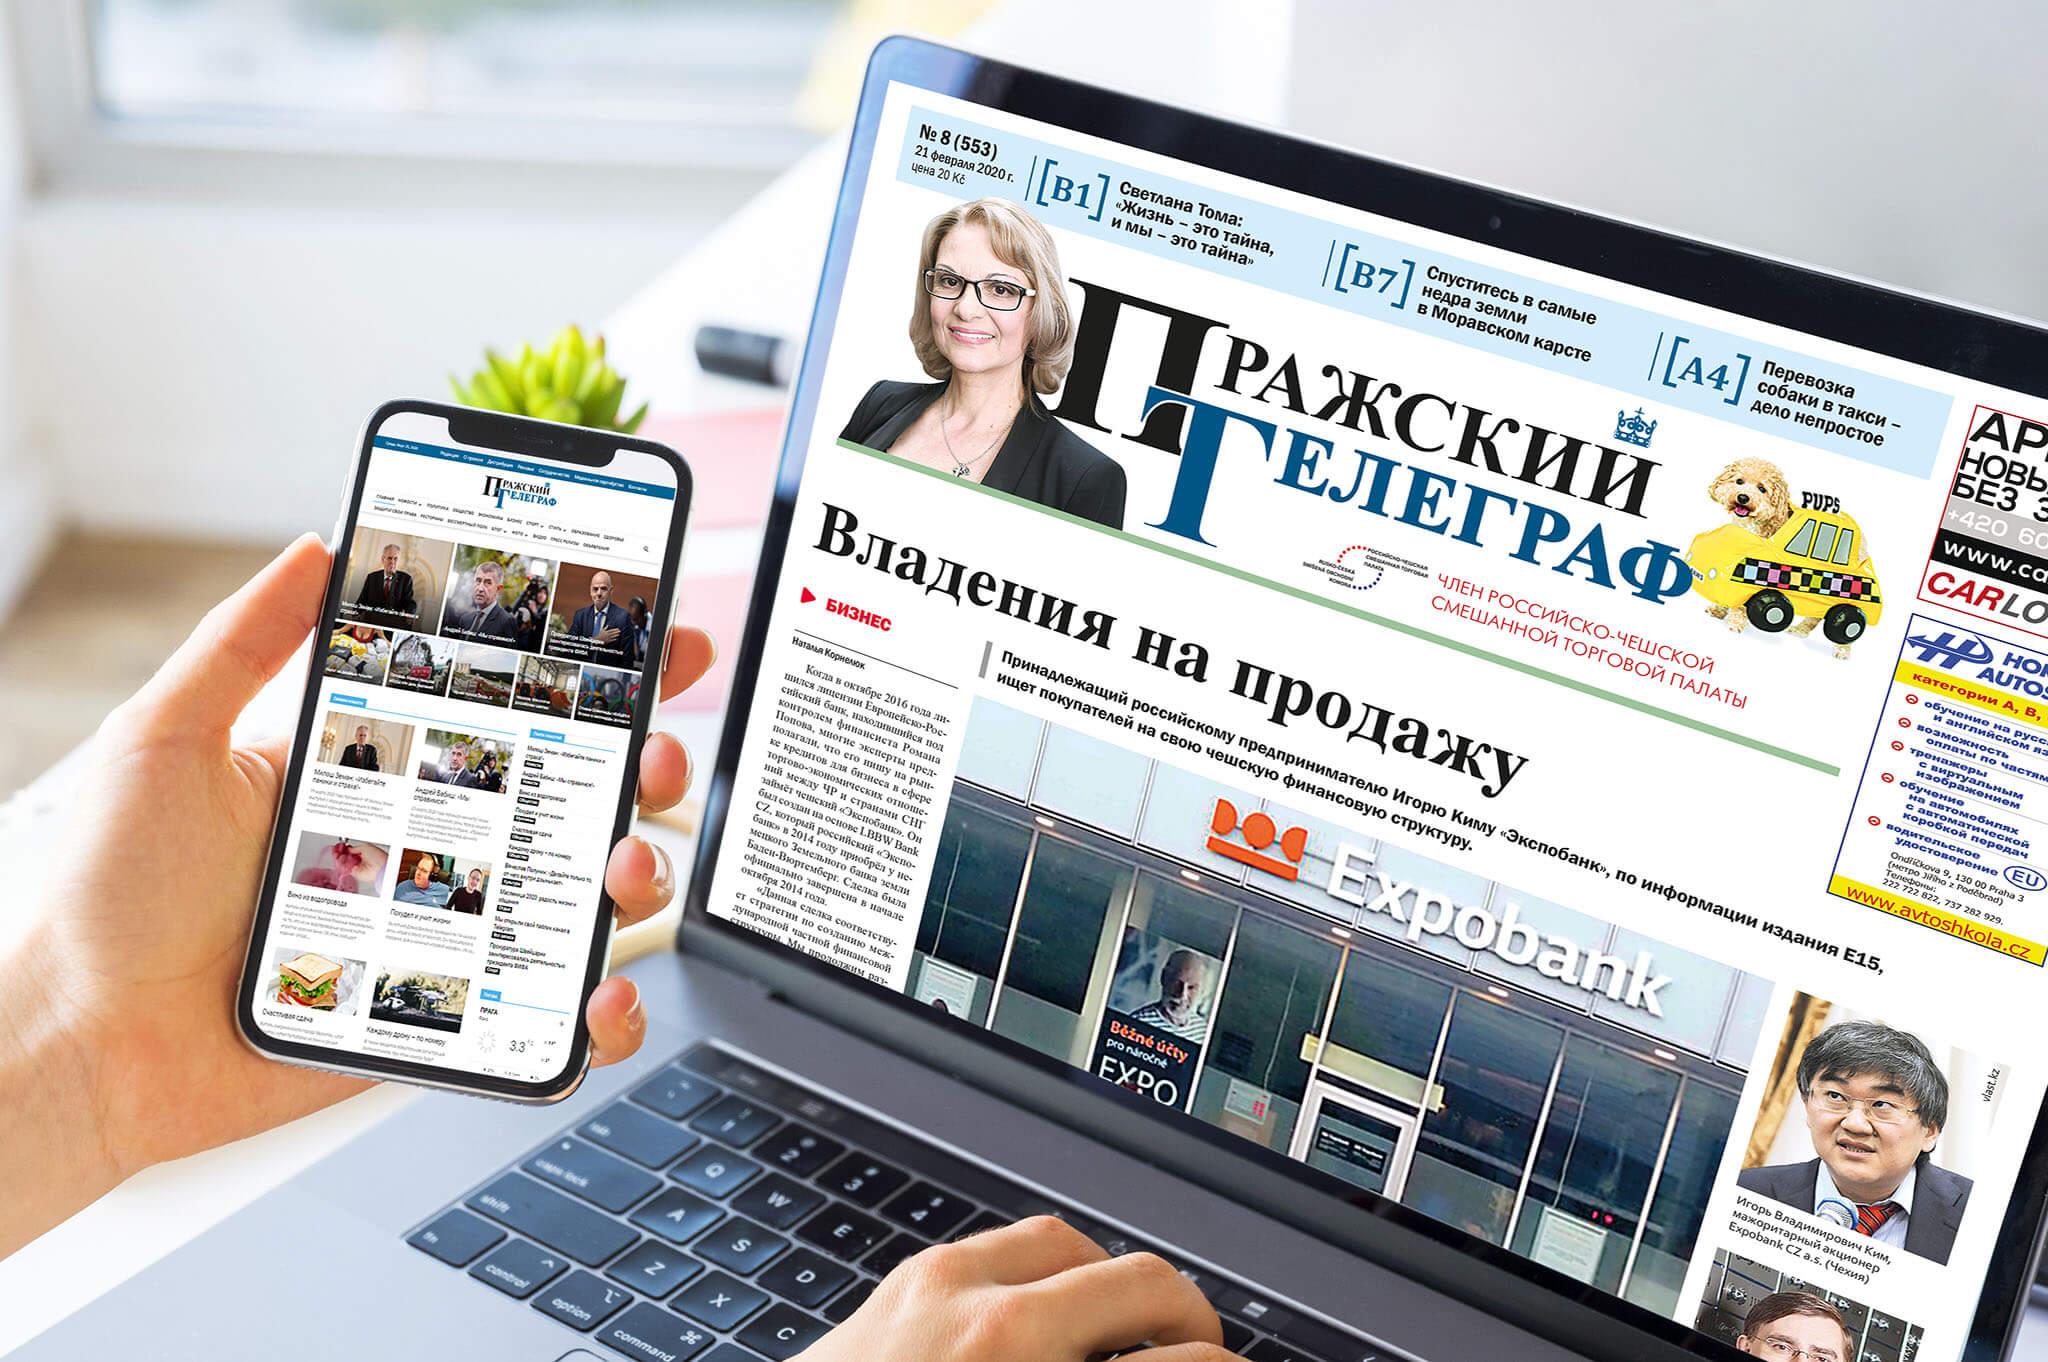 О проекта Пражский Телеграф